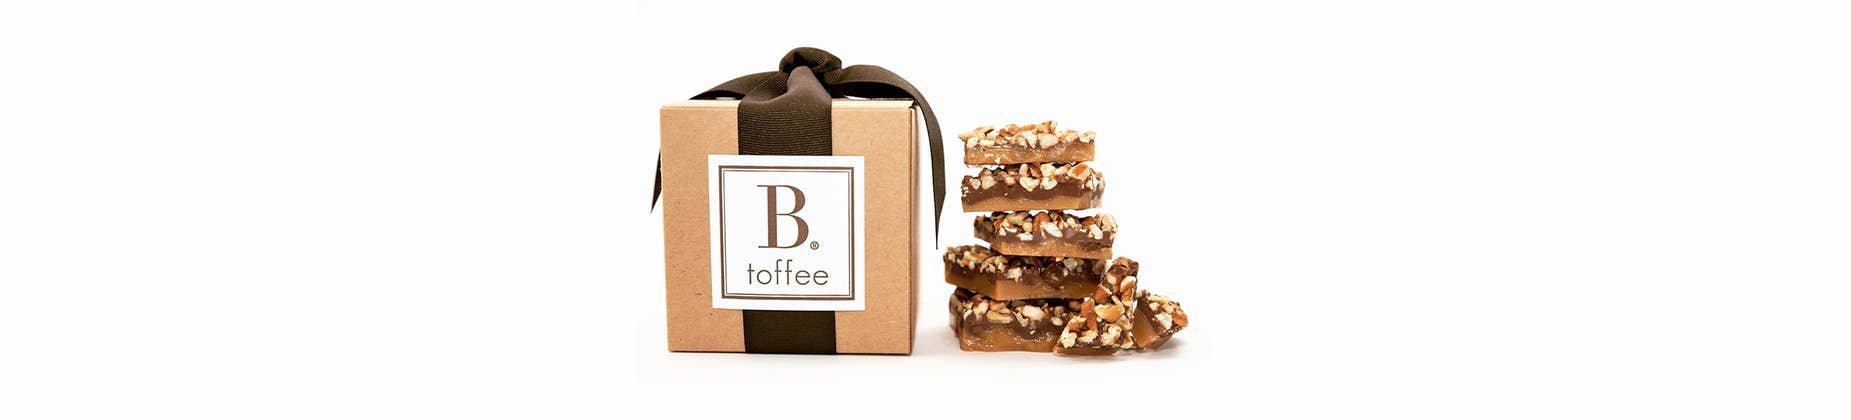 B Toffee Dark Chocolate